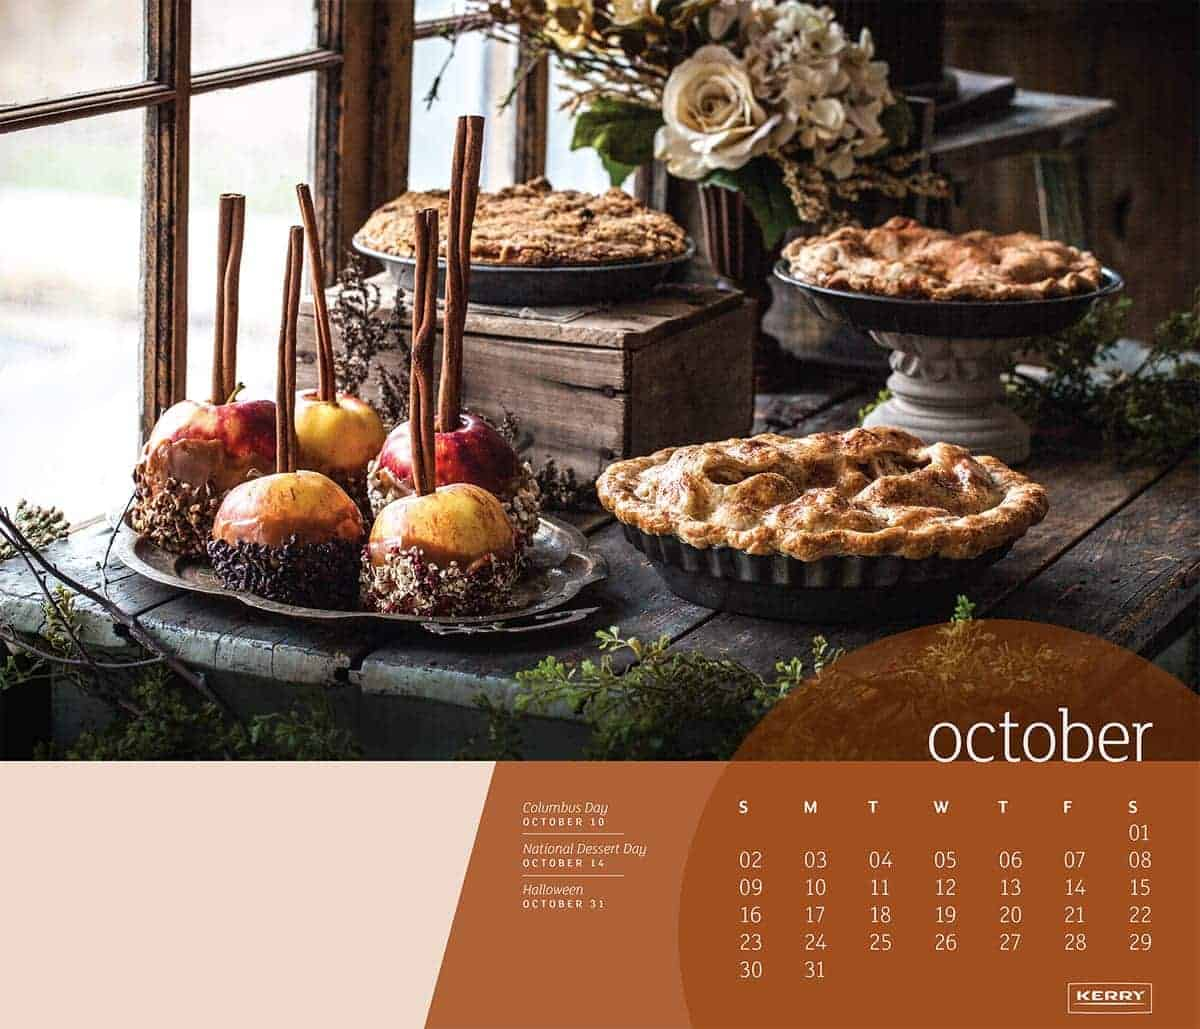 2016 Kerry Holiday Calendar_Jena Carlin Photography_96-12